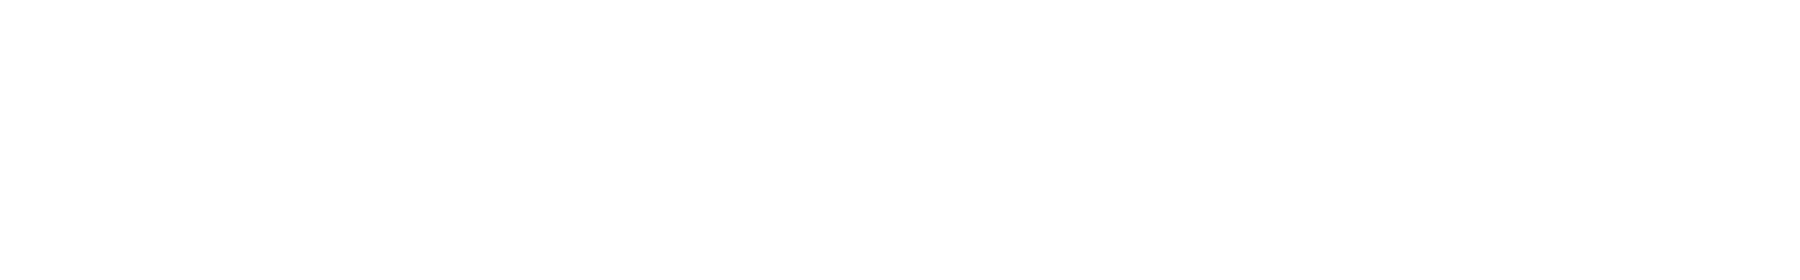 shg music loop 05 p1